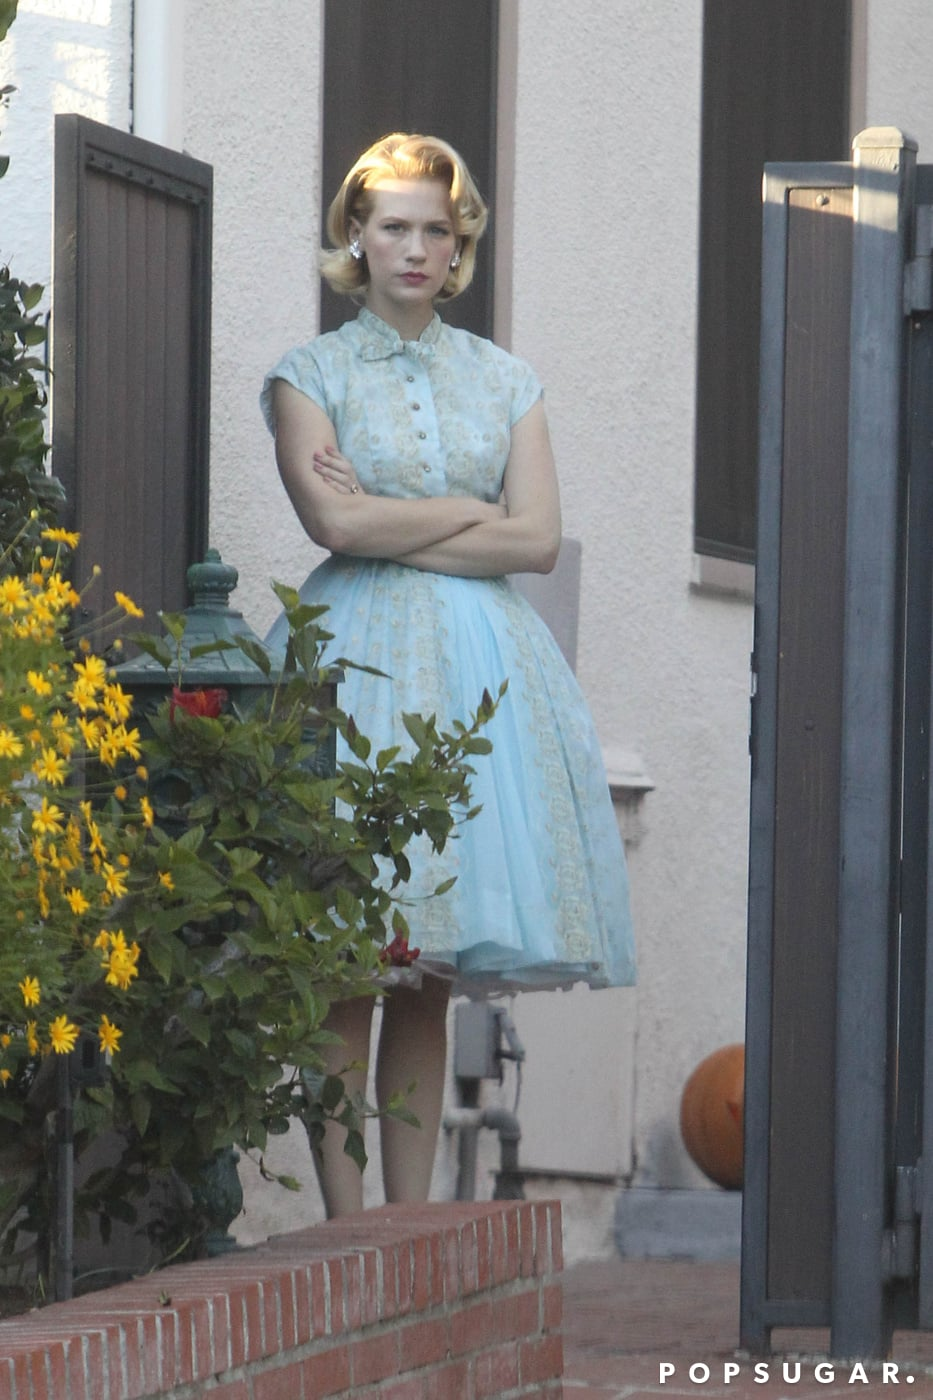 January Jones dressed up as Betty Draper for Halloween.